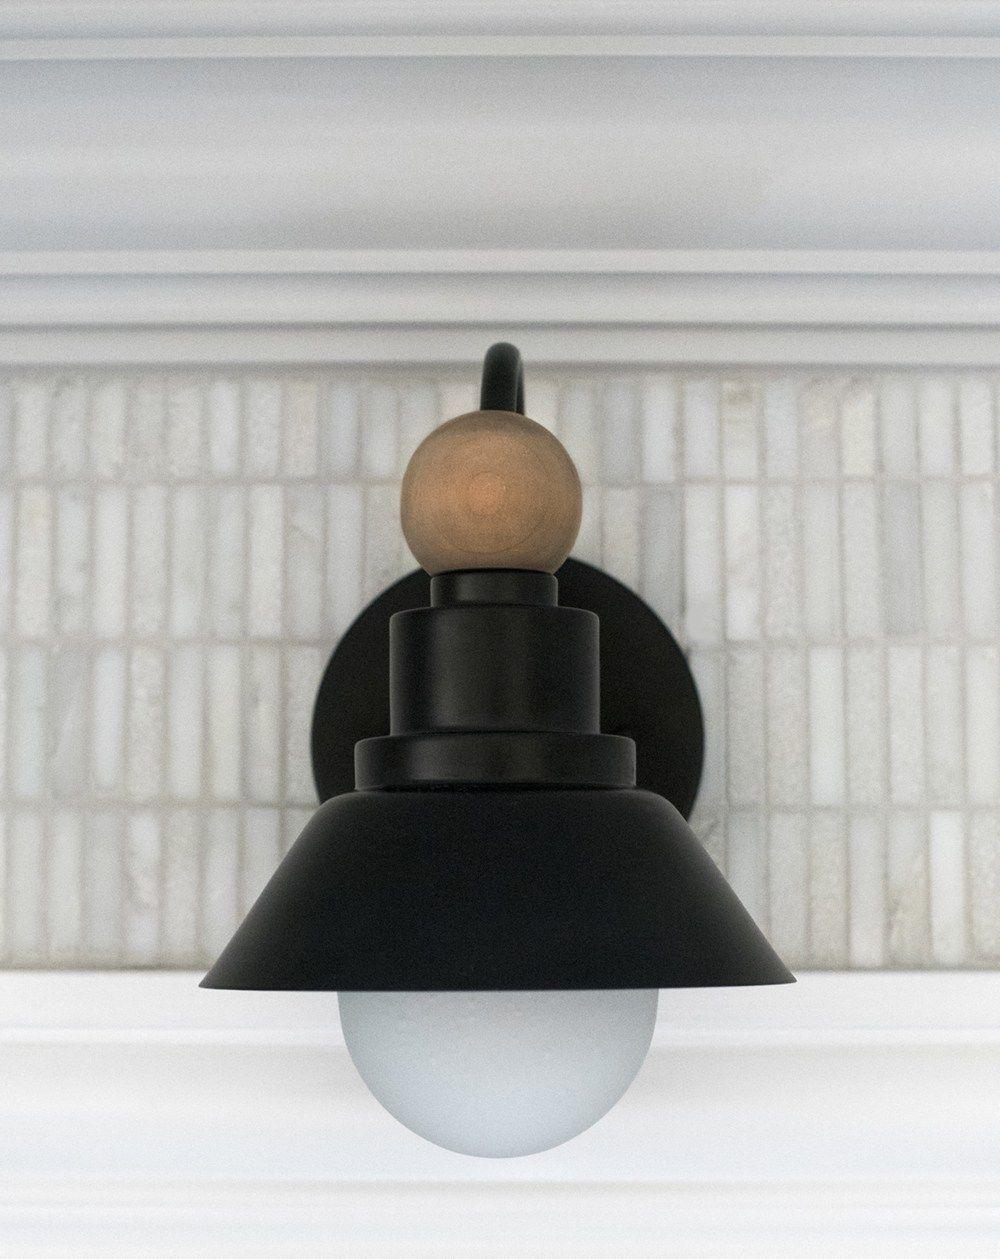 Wood Detail Sconce Diy Room For Tuesday Blog Diy Light Fixtures Room Diy Wood Detail